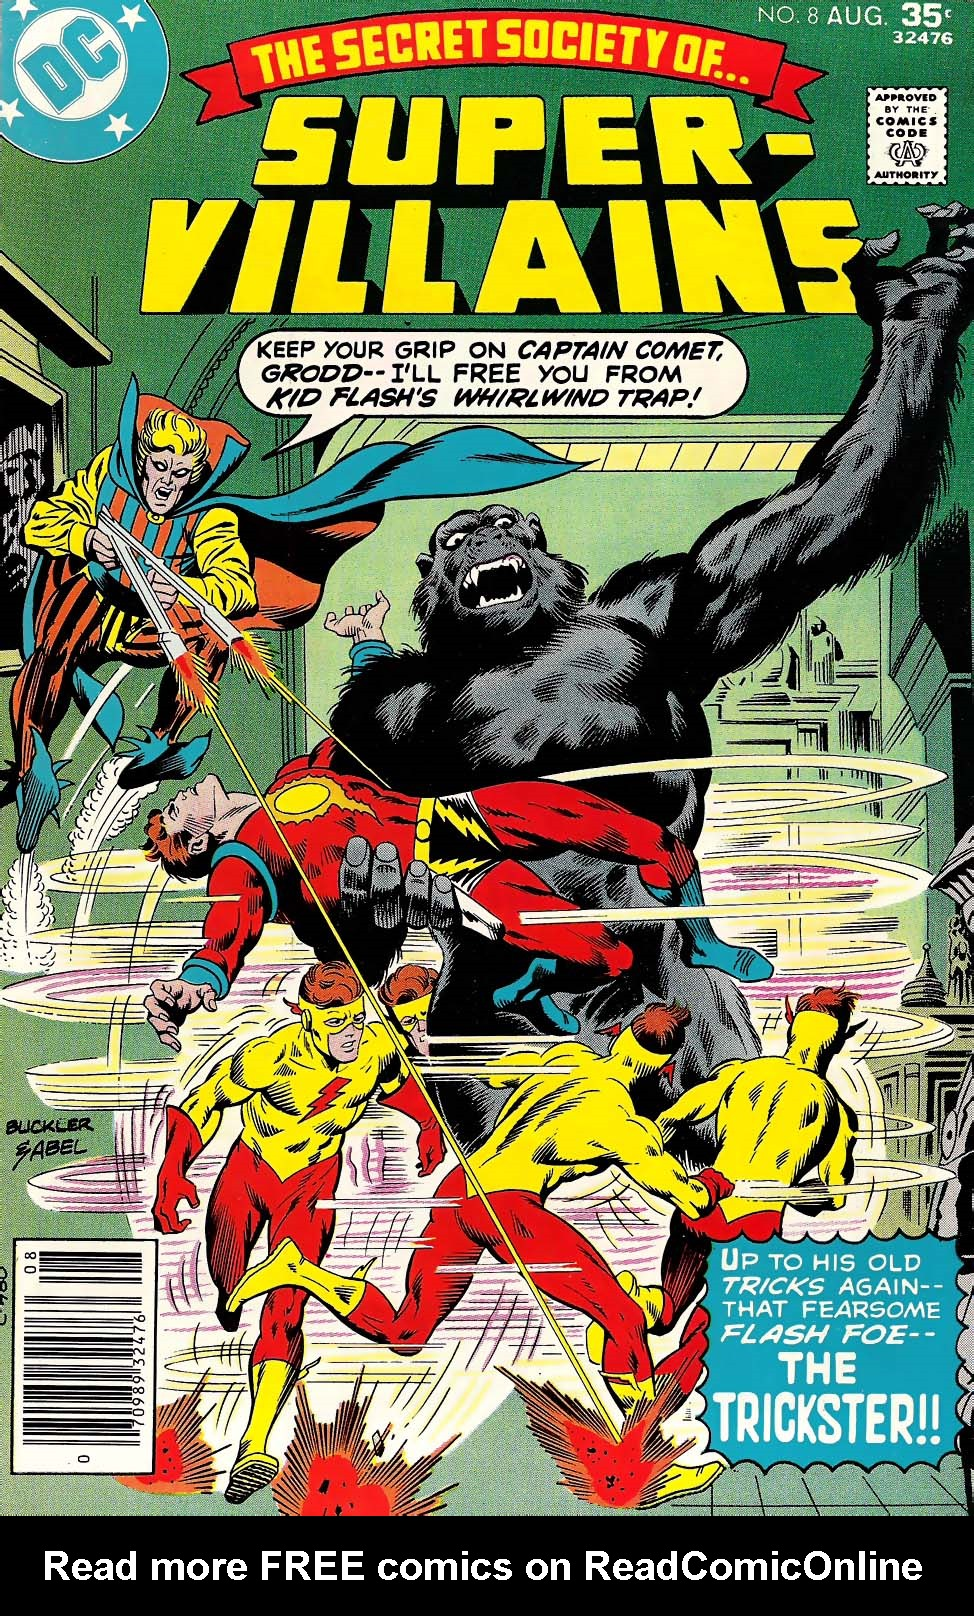 Read online Secret Society of Super-Villains comic -  Issue #8 - 1